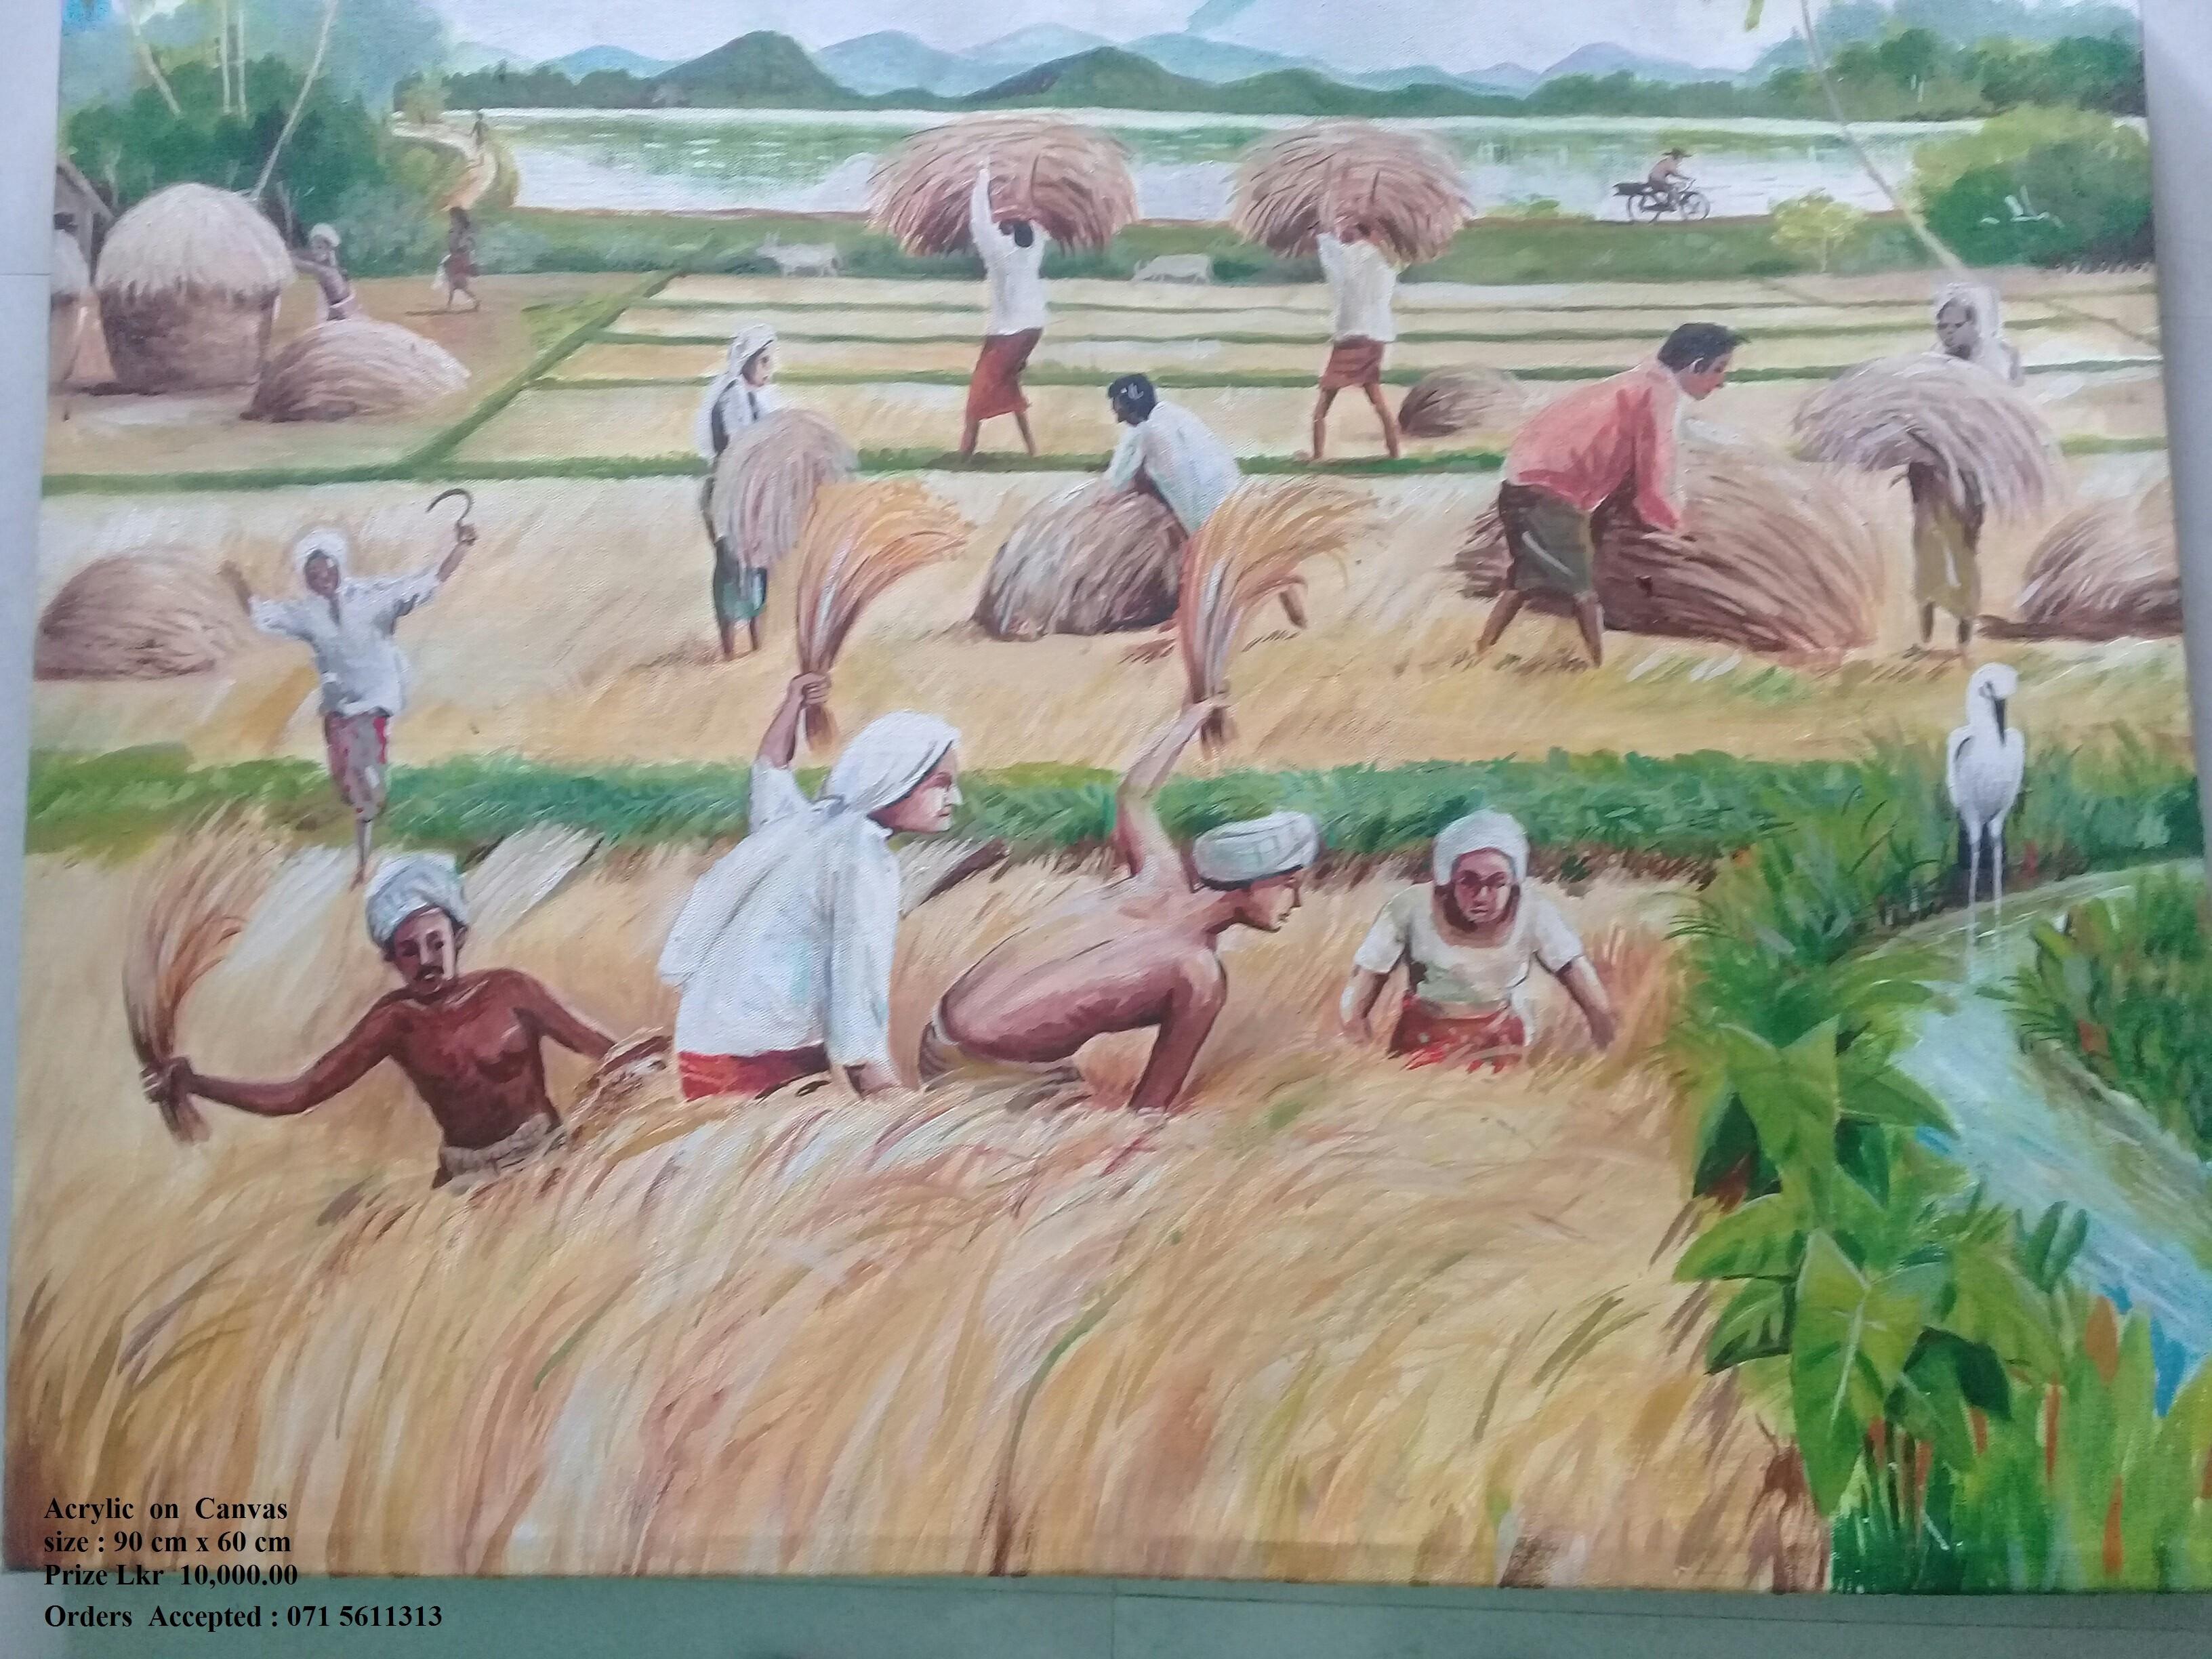 Harvesting by Wickramasinghe Arachchige Jayarathna